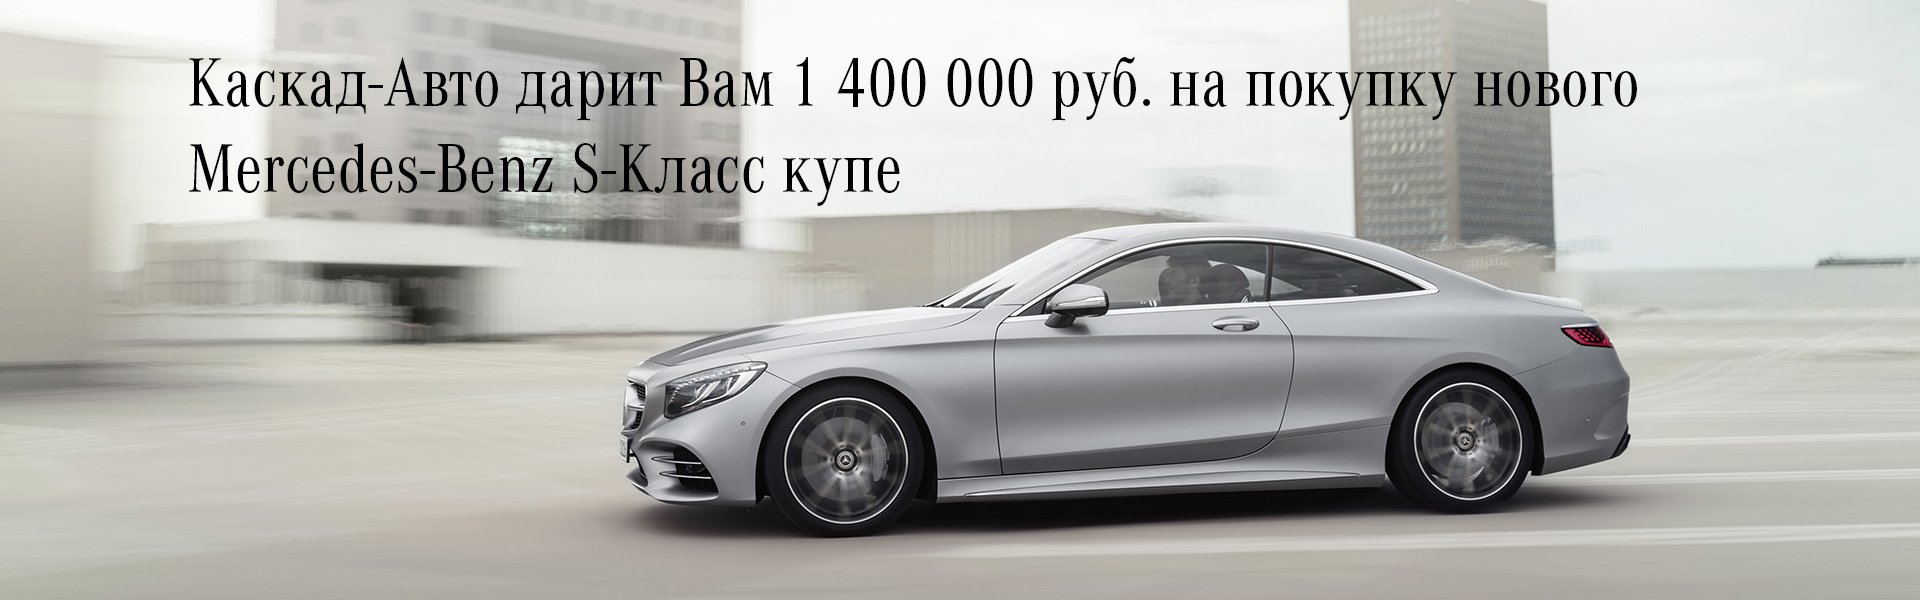 S-Класс купе